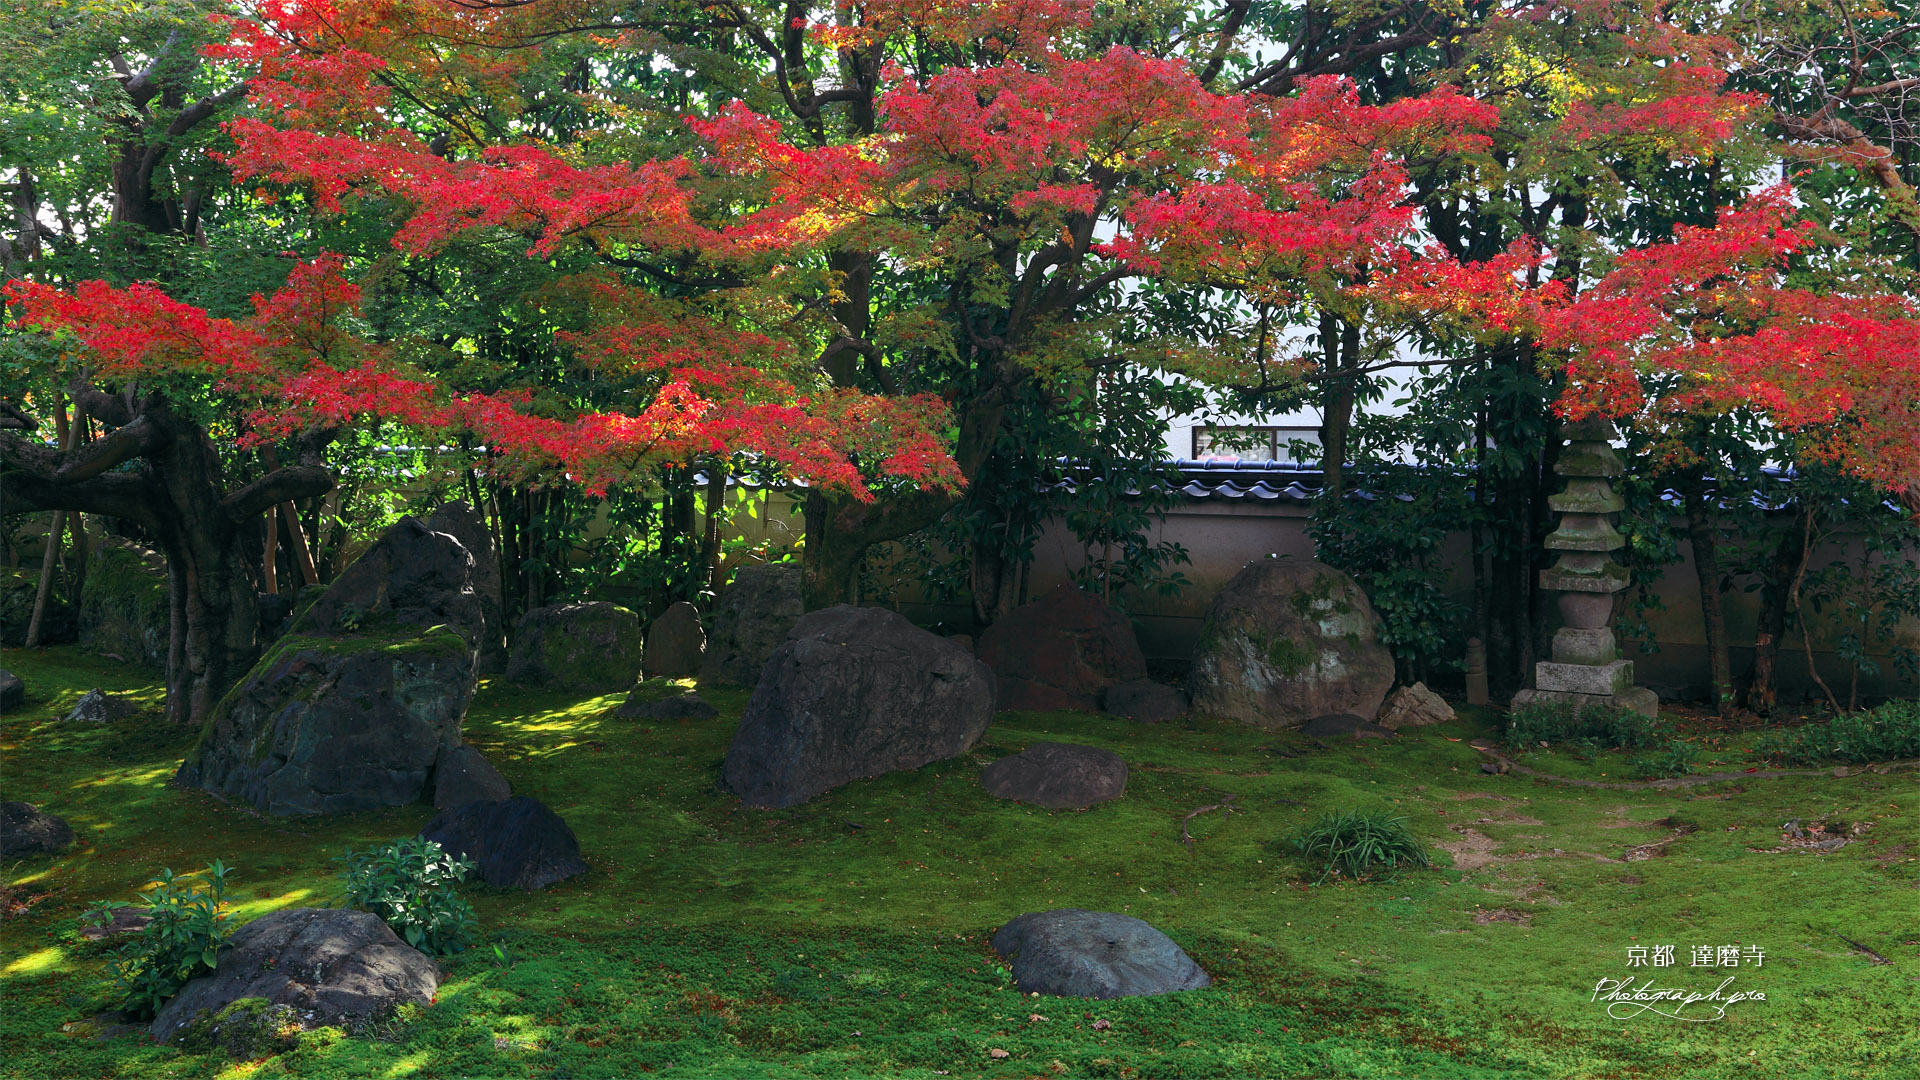 京都達磨寺 無尽庭の紅葉